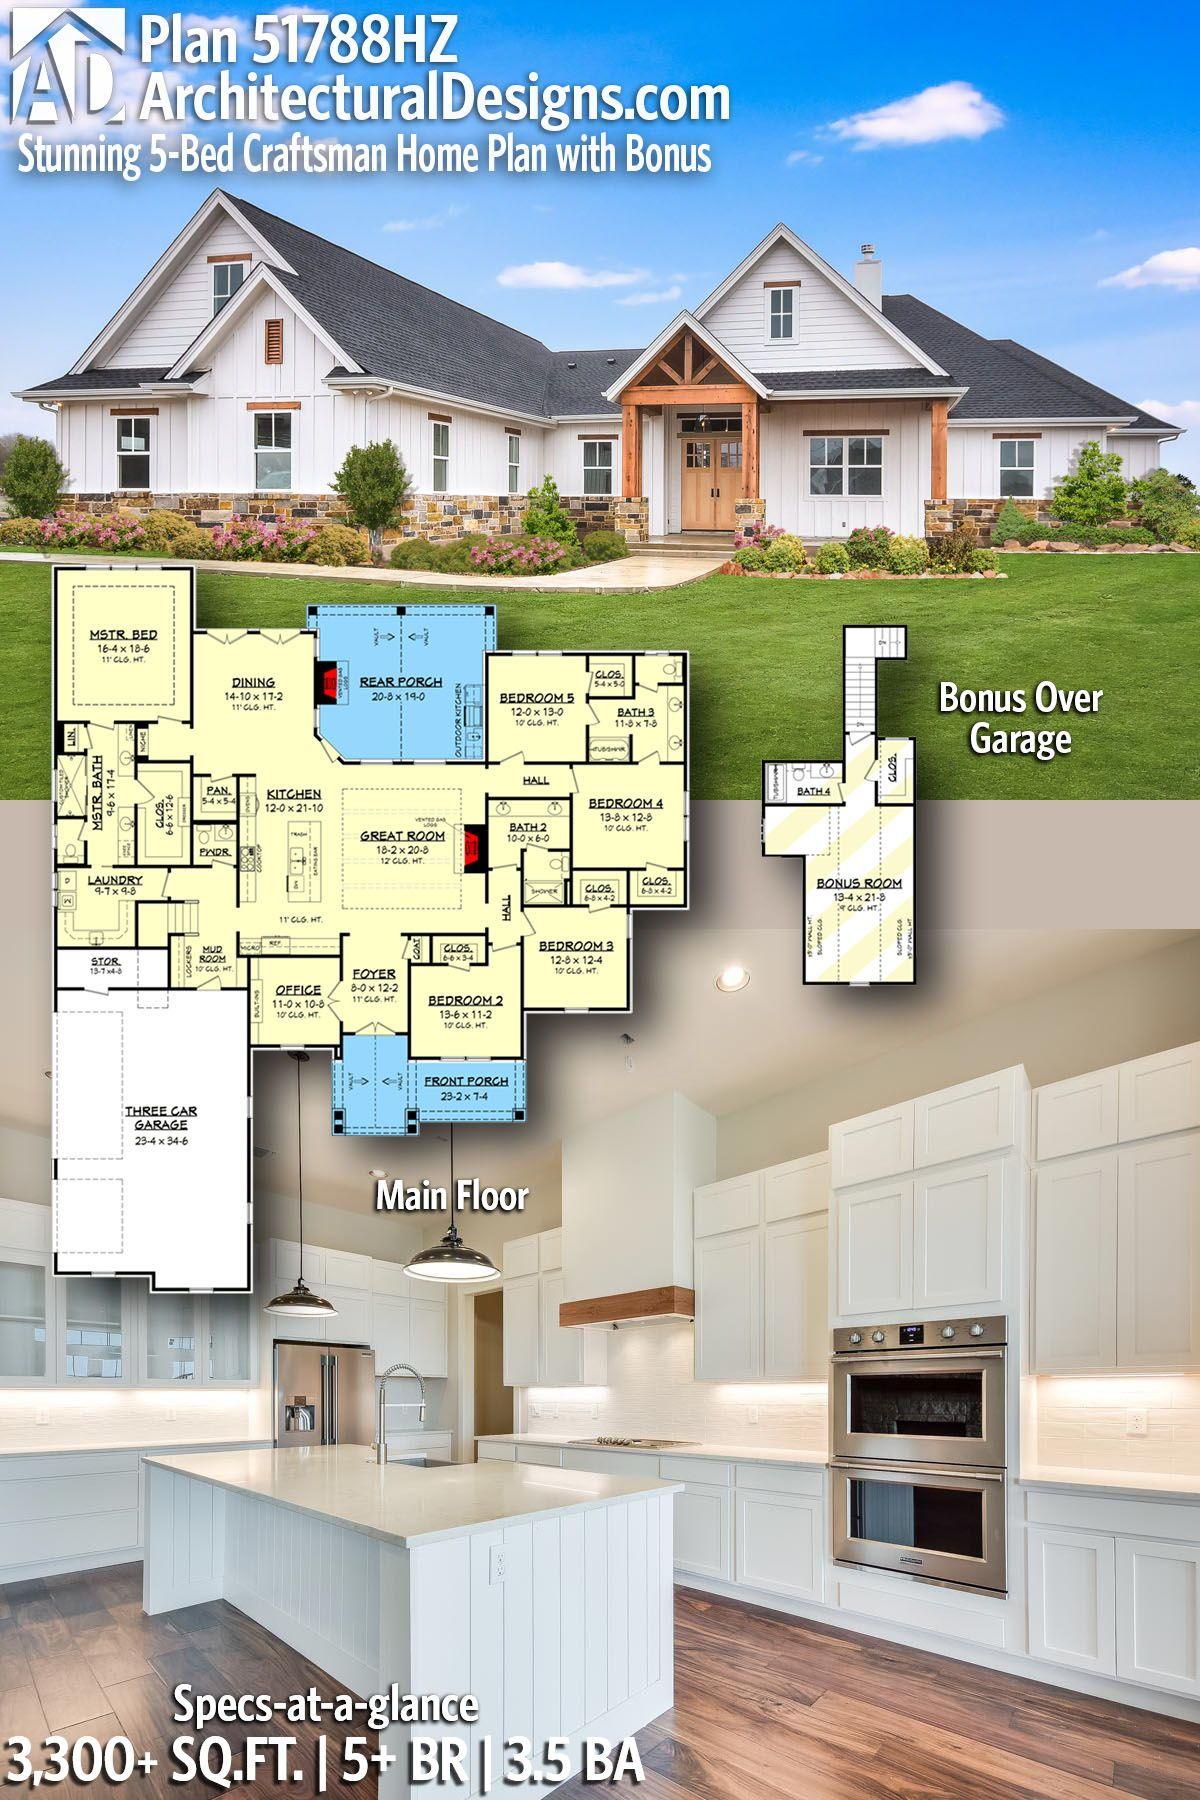 Plan hz stunning bed craftsman home plan with bonus